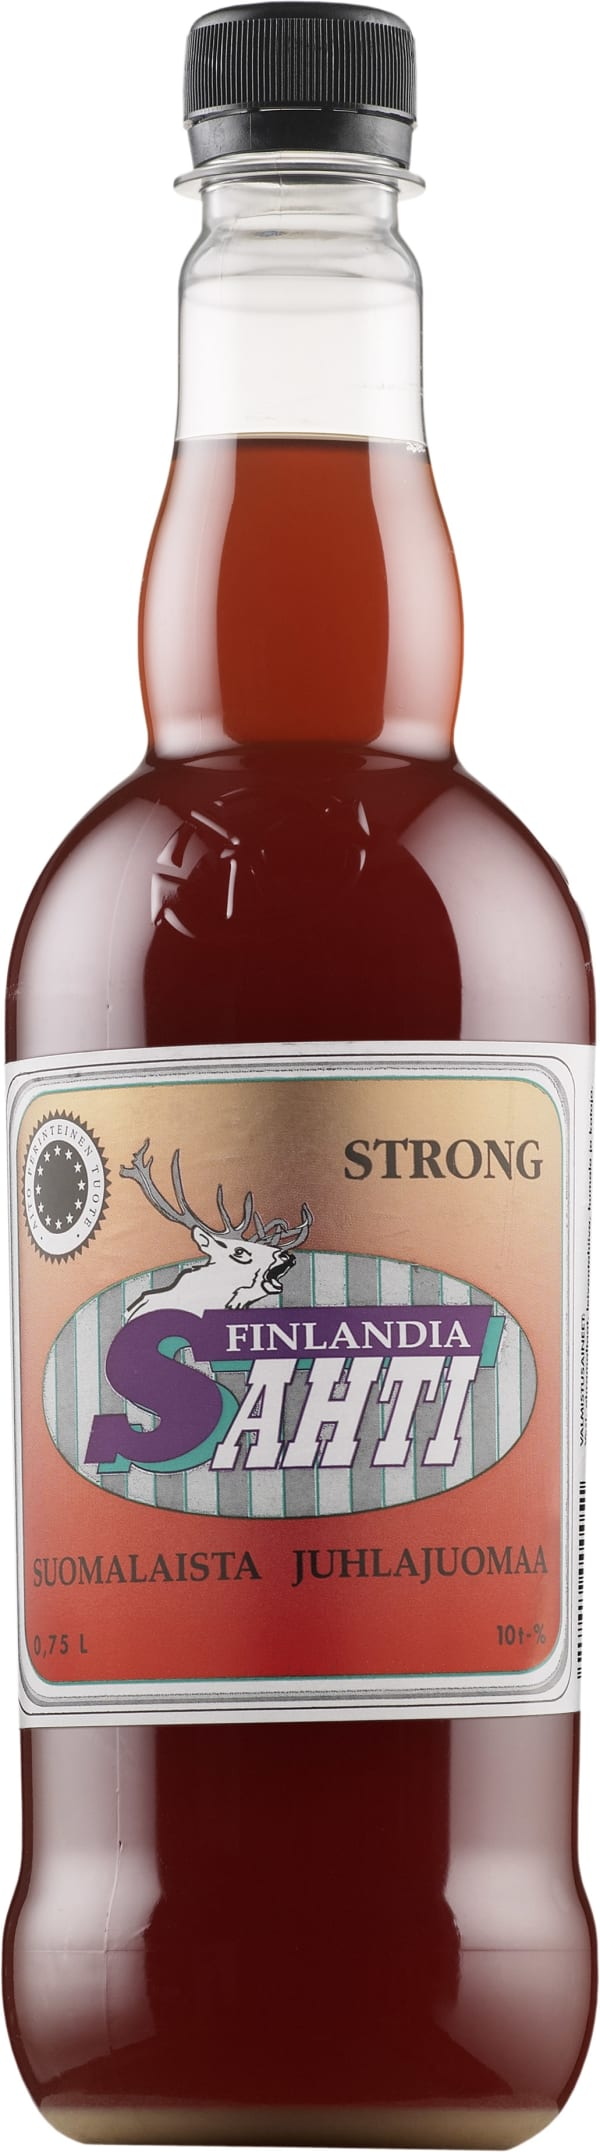 Finlandia Sahti Strong plastflaska